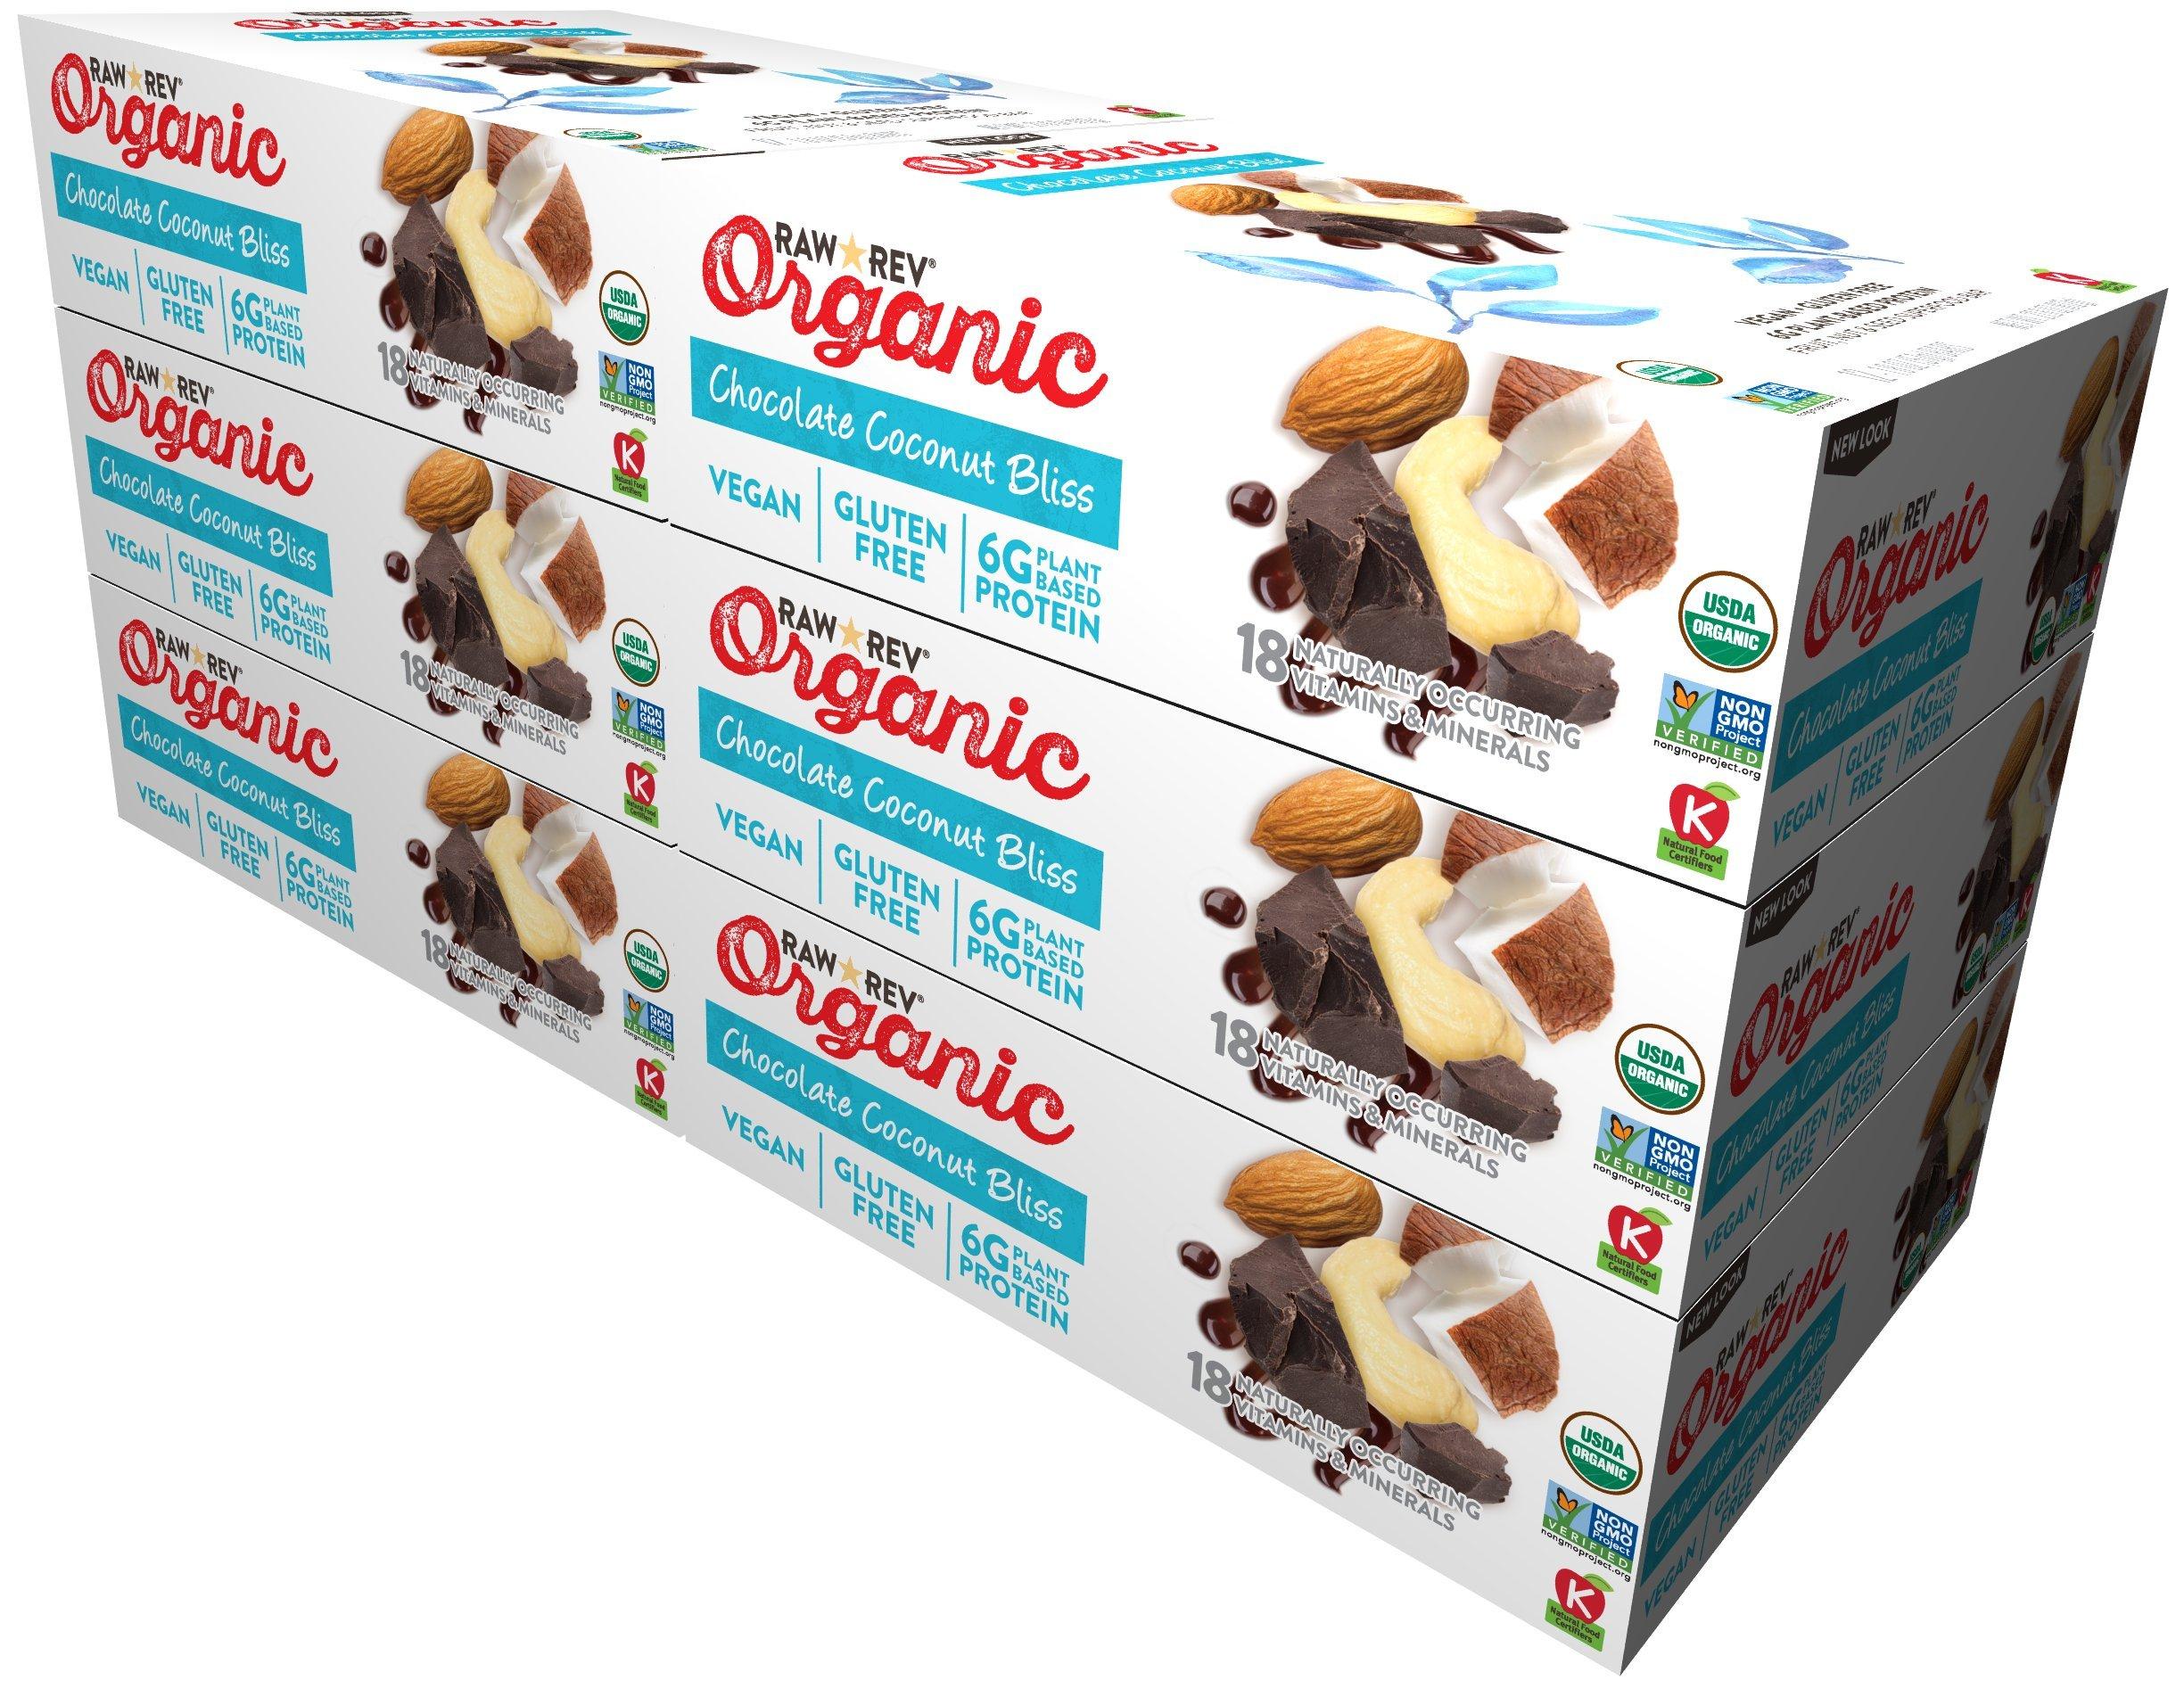 Raw Rev Organic Vegan, Gluten-Free Fruit, Nut, Seed Bars – Chocolate Coconut Bliss 1.8 ounce (Pack of 72)